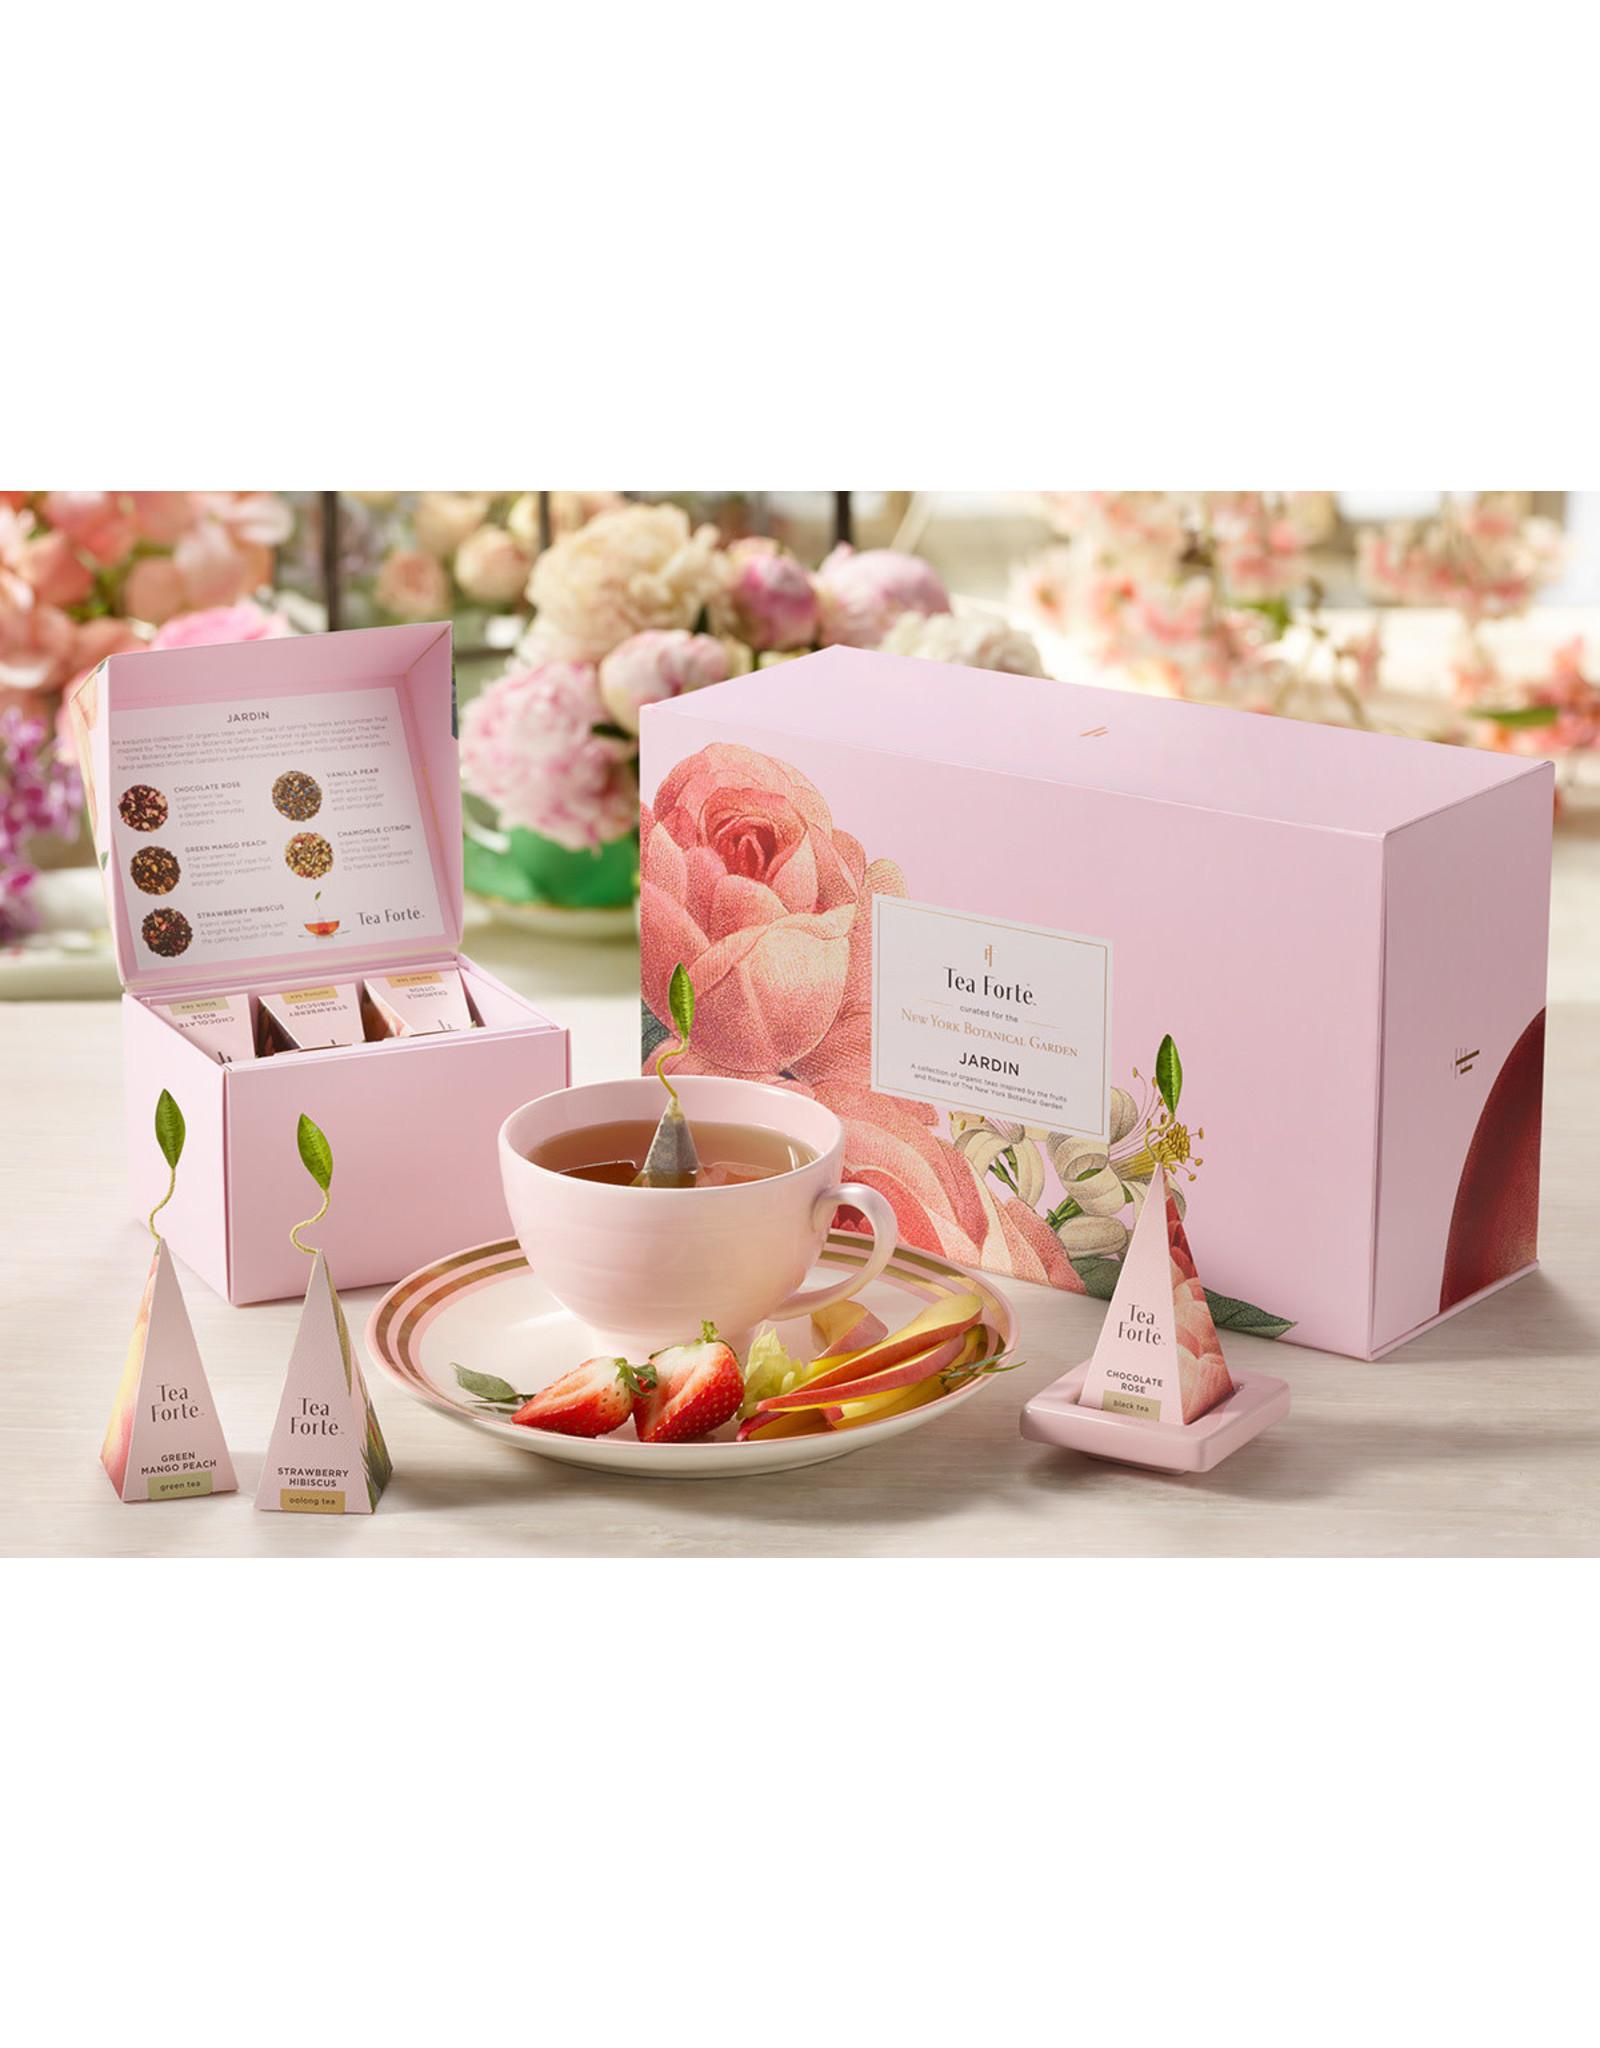 Tea Forte Garden Set